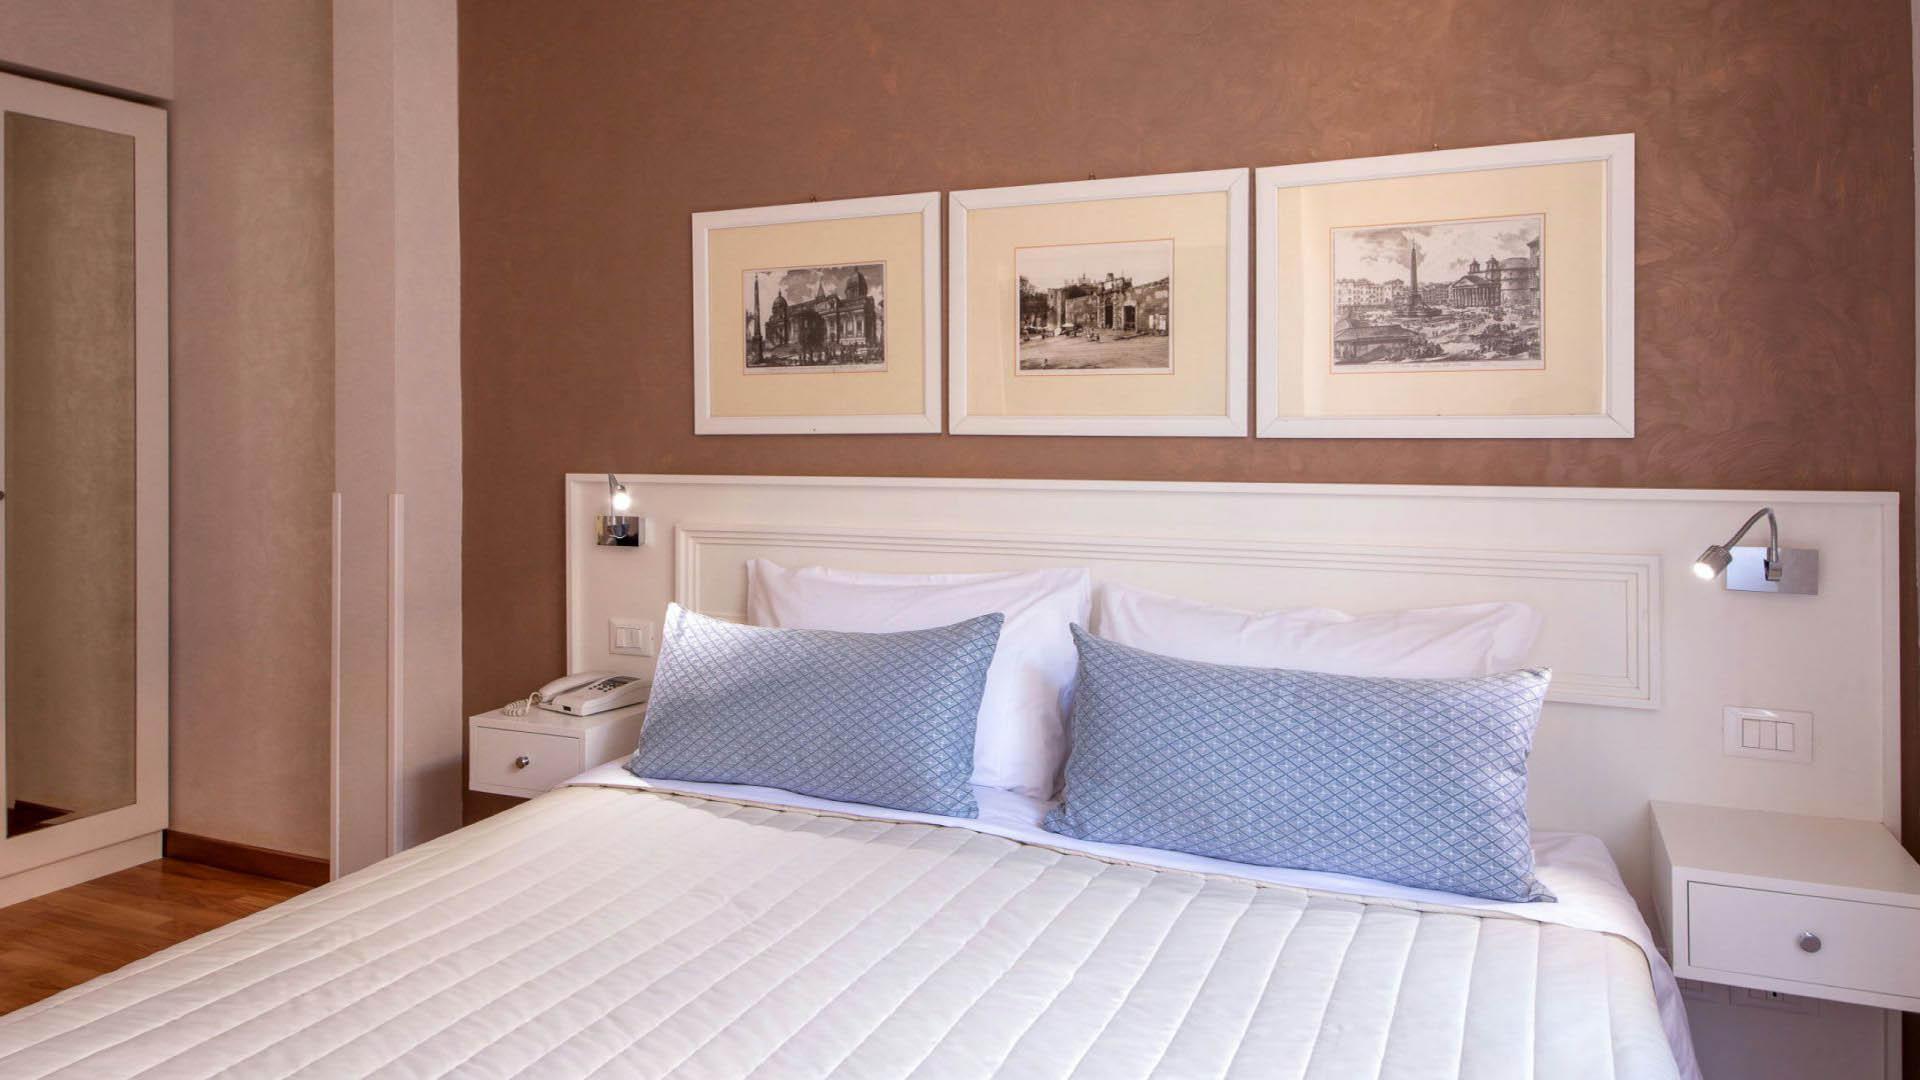 фото-отель-Оксфорд-Рим-комната-11